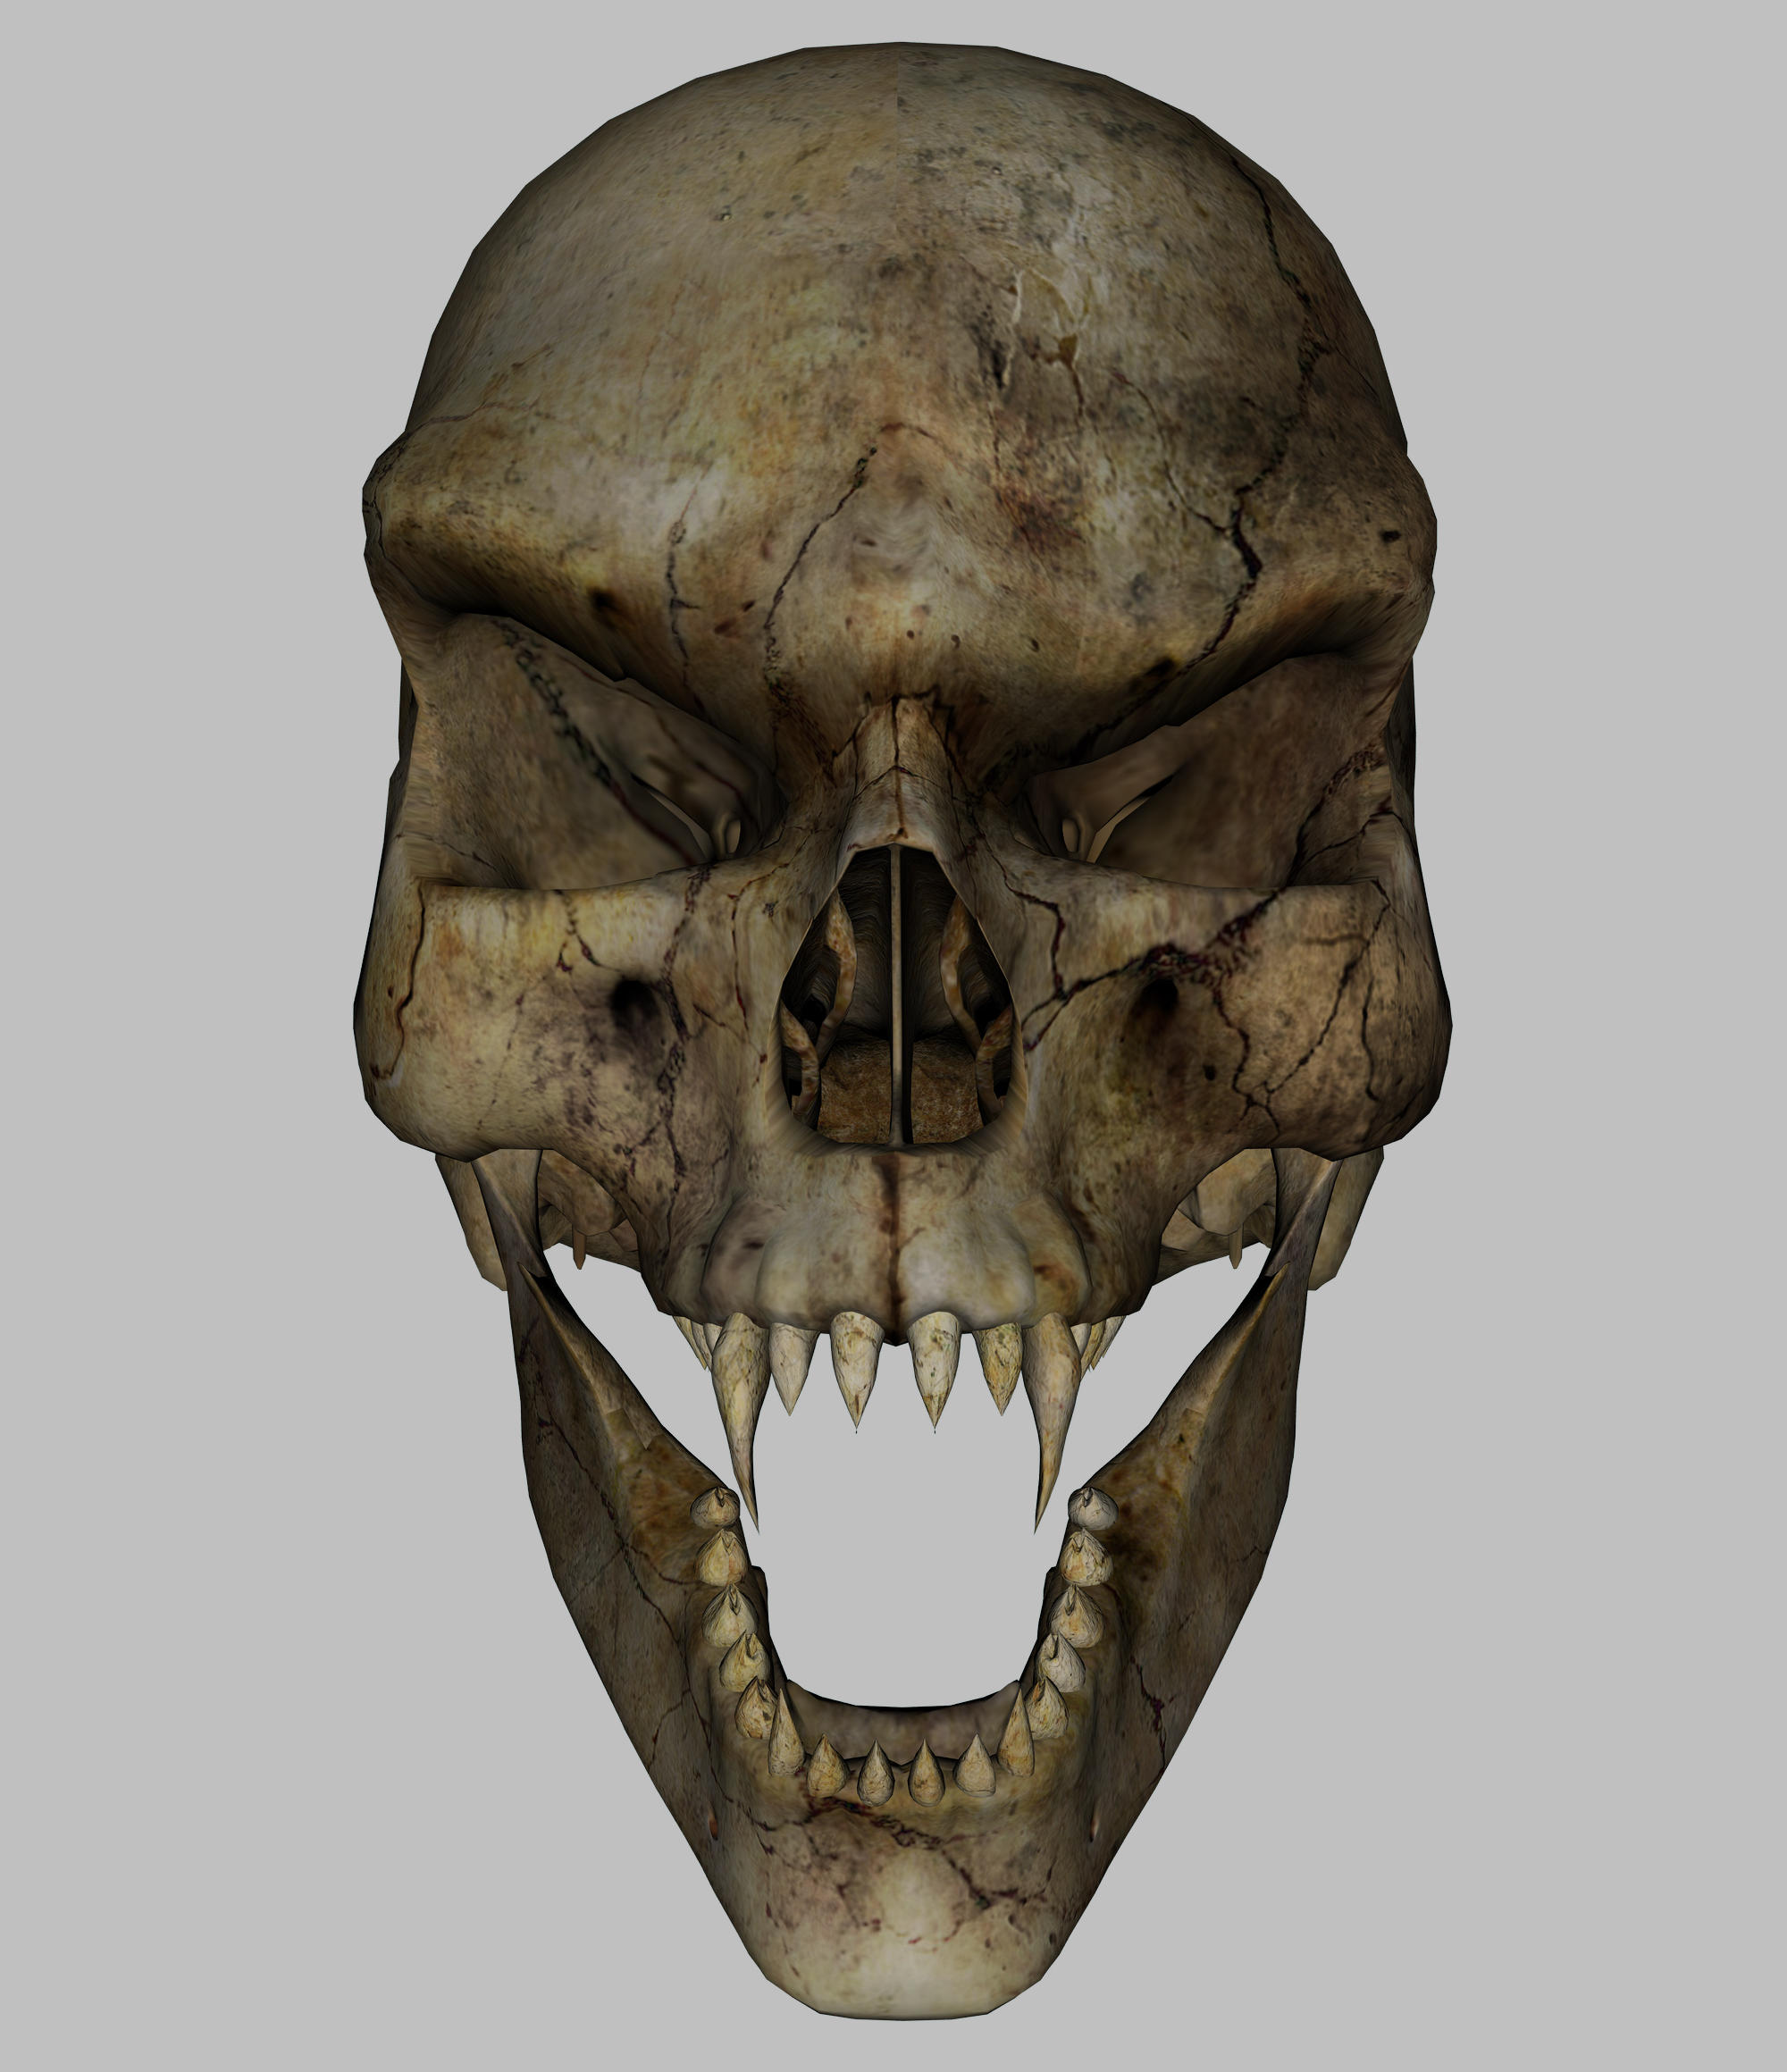 Skull - Vampire 1 by markopolio-stock